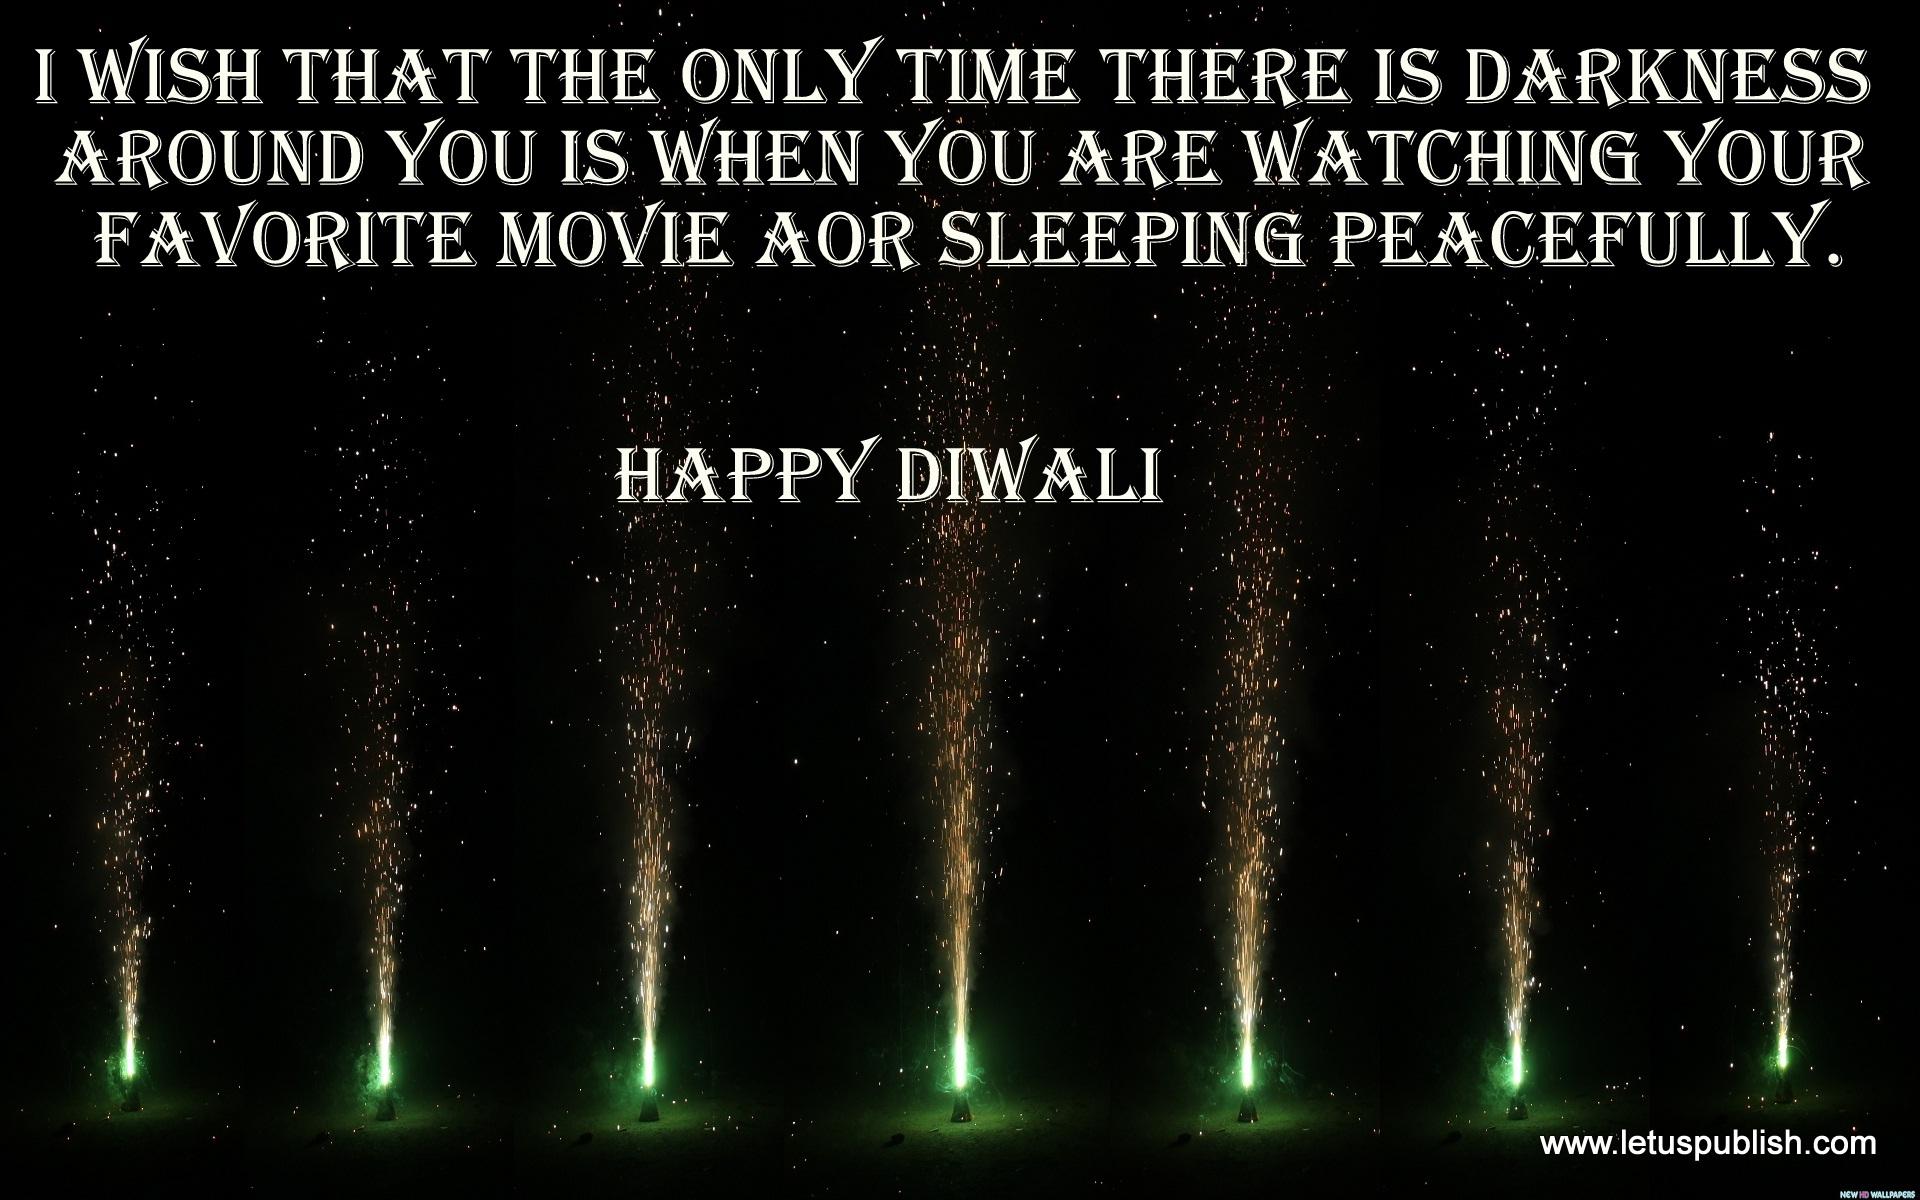 Free Download Diwali images